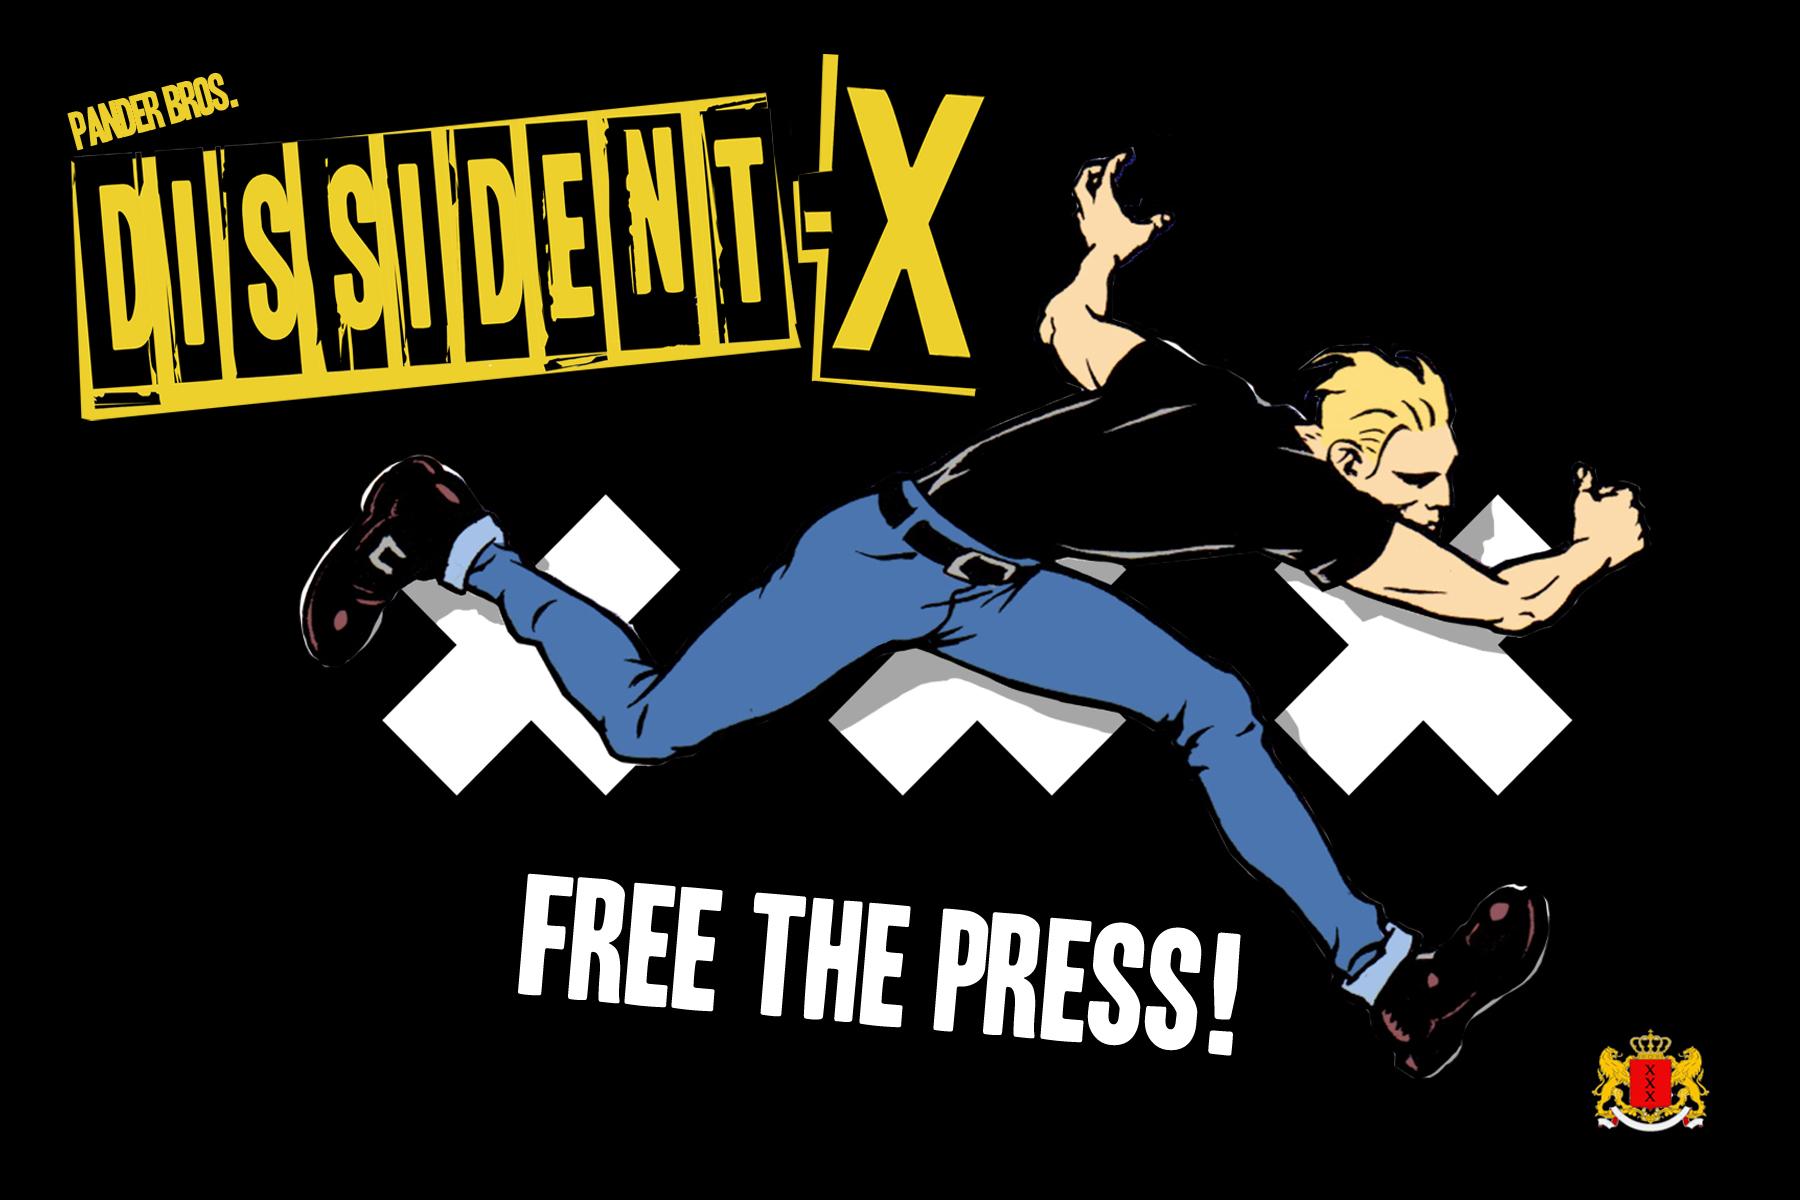 Dissident-X_Running Man clr-BLK-2.jpg